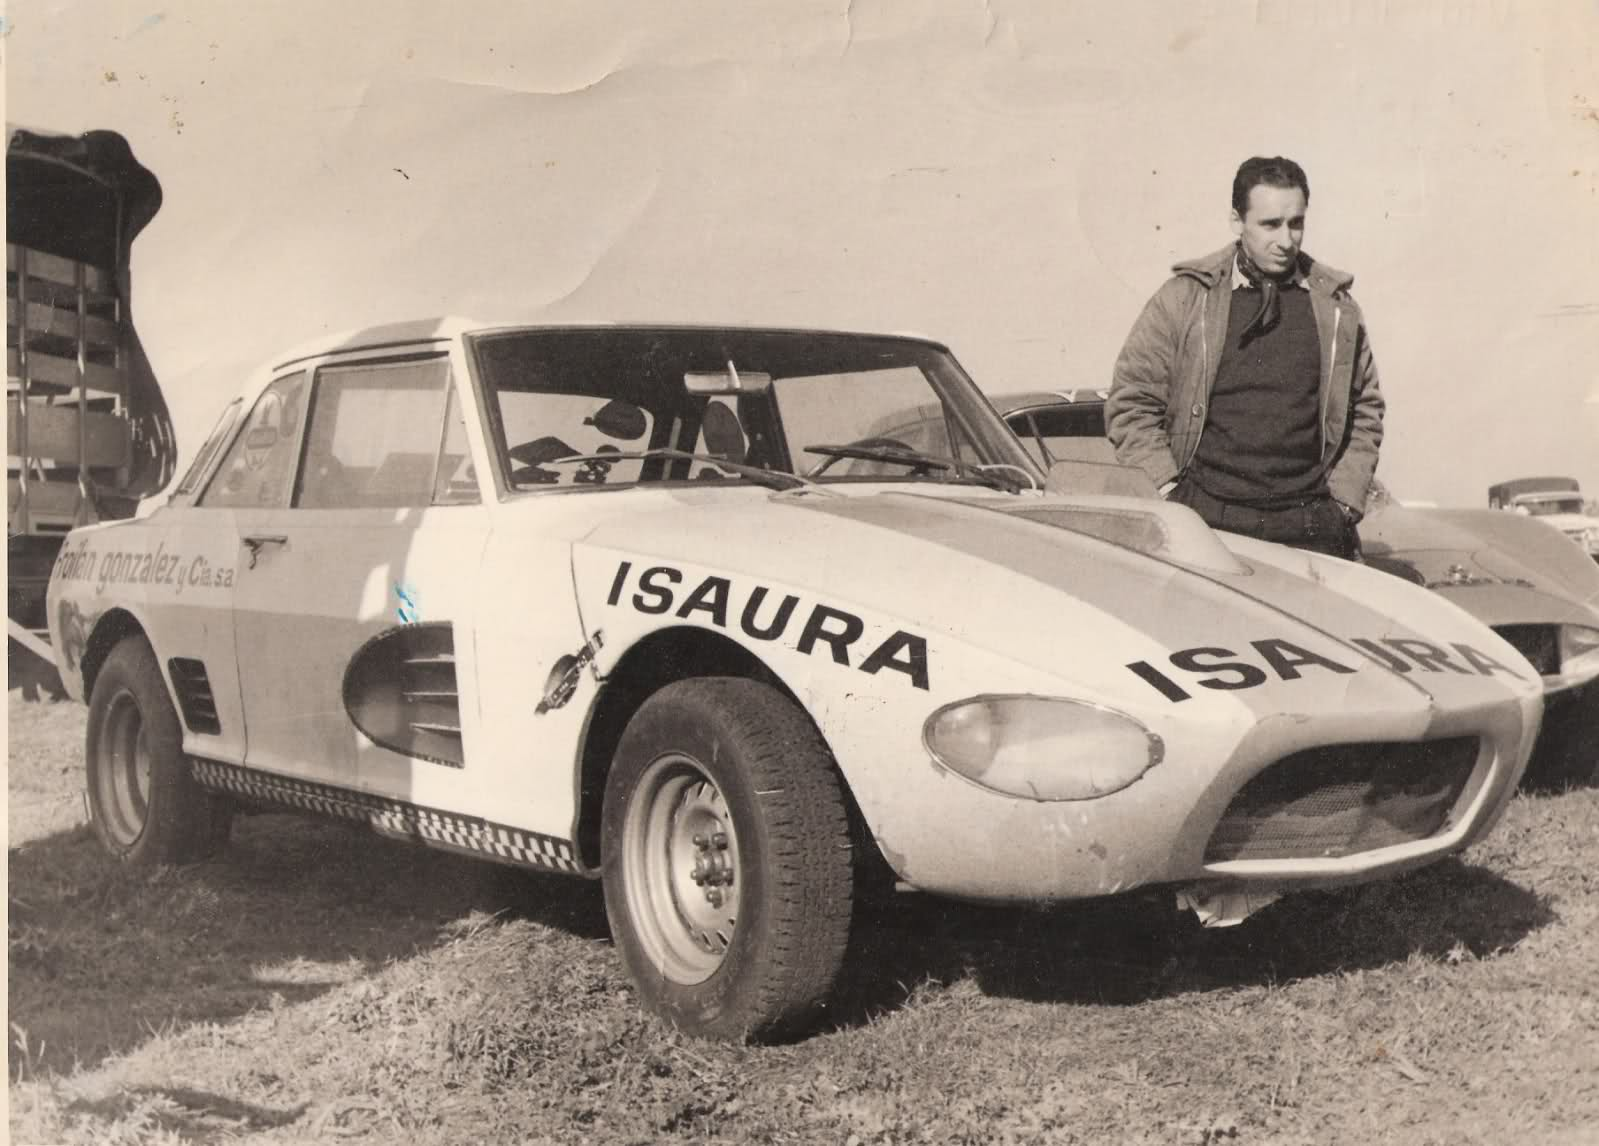 17 de abril, 1966 / JORGE CUPEIRO GANABA LA SEGUNDA VUELTA DE GENERAL PICO